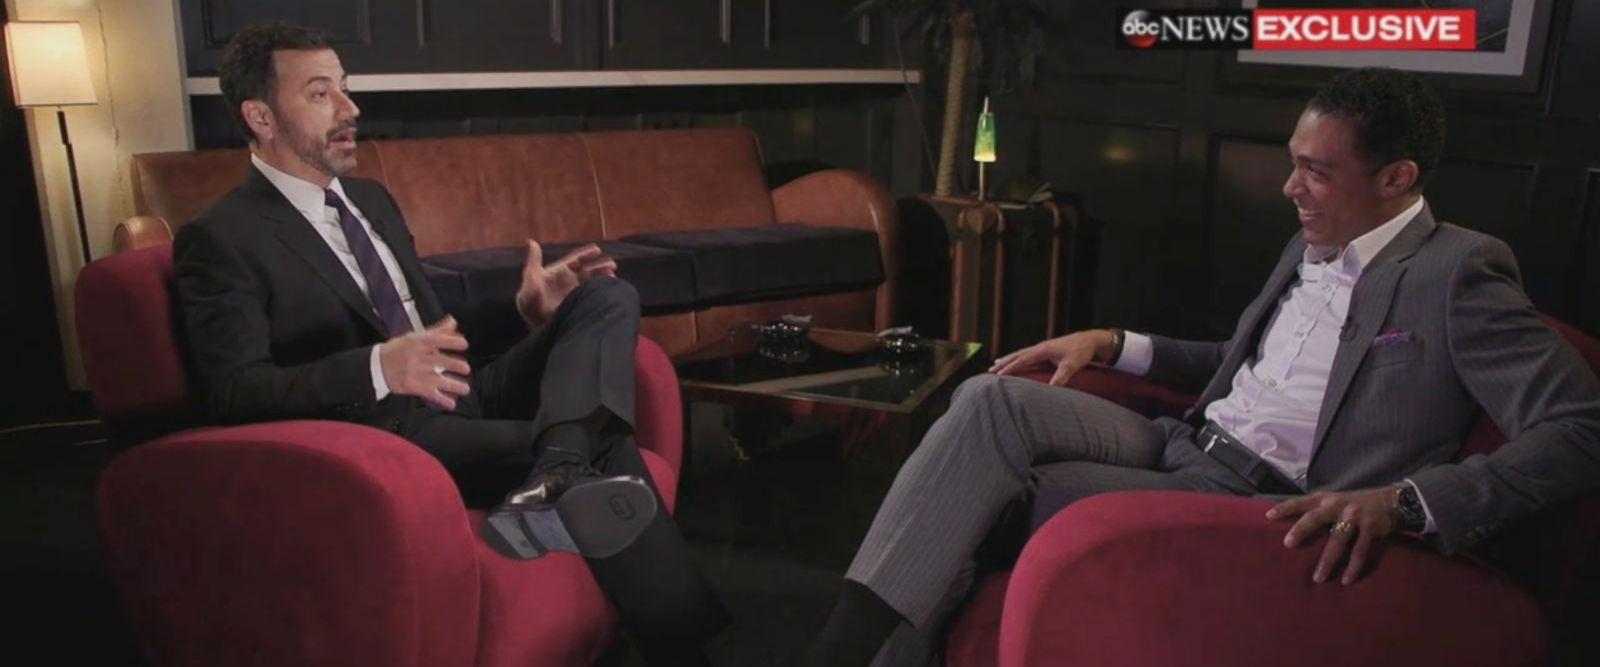 VIDEO: Oscars host Jimmy Kimmel preparing for 'standoff' with nominee Matt Damon